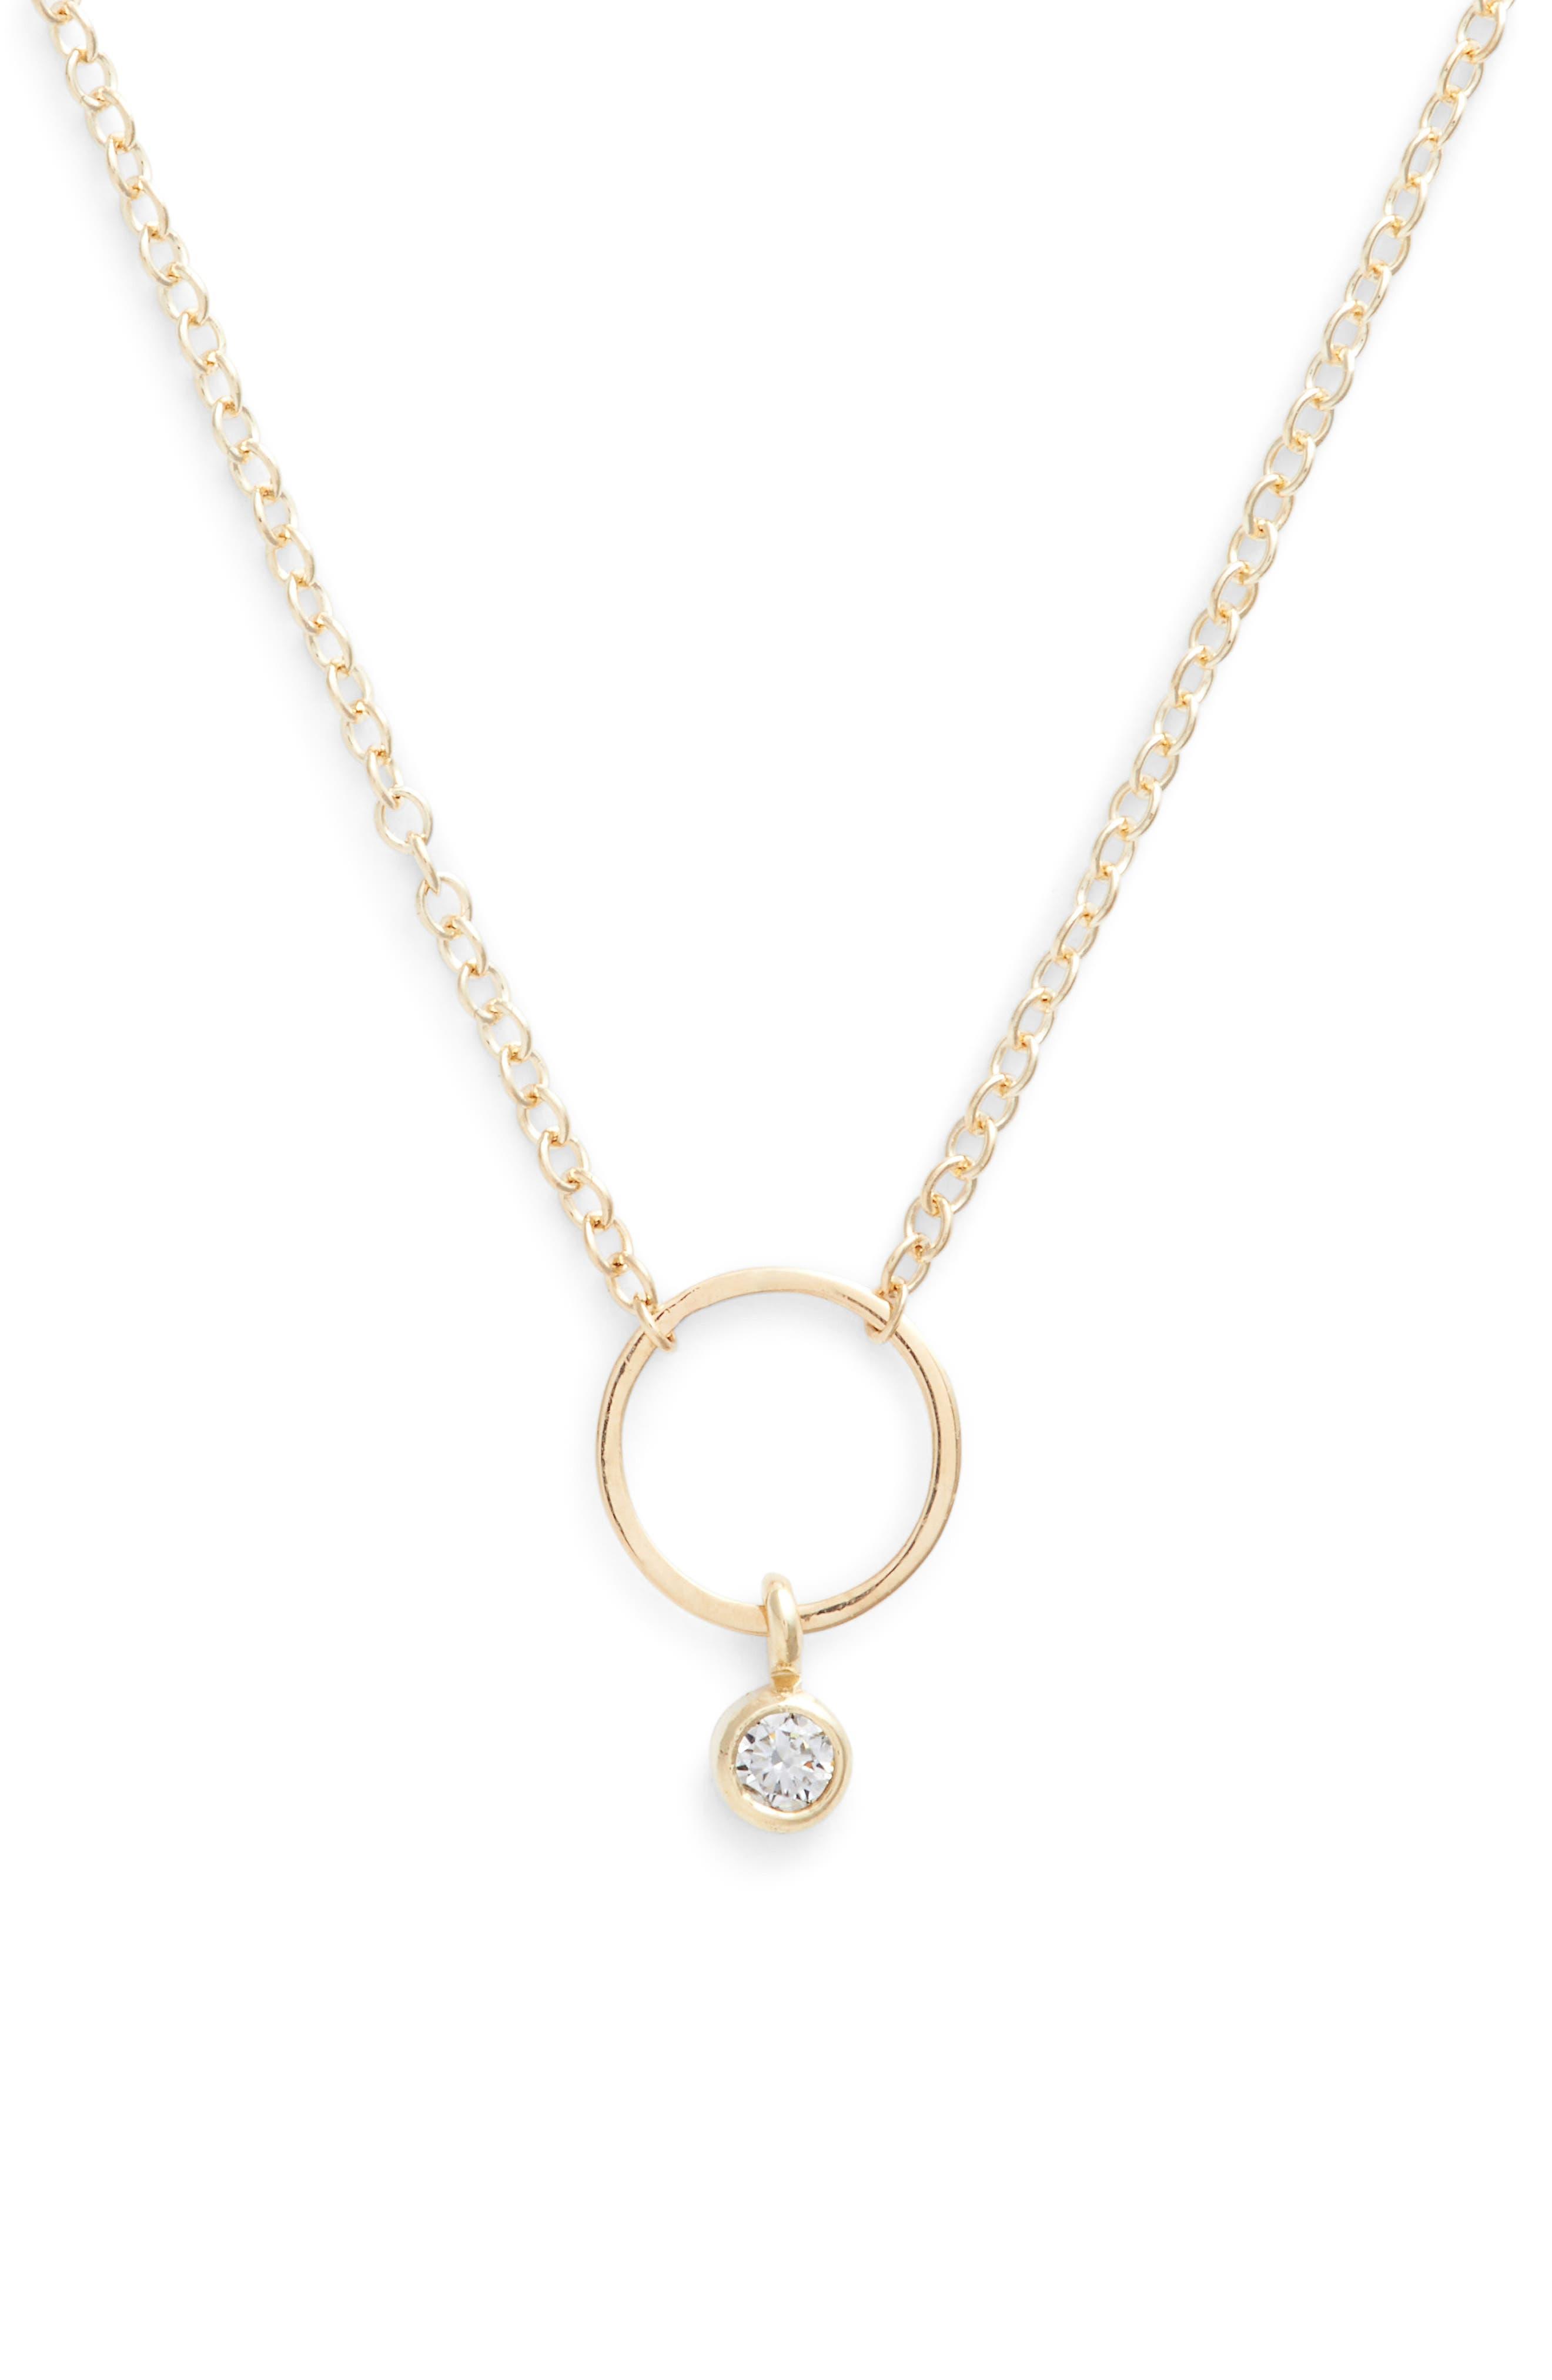 Dangling Diamond Circle Pendant Necklace,                         Main,                         color, YELLOW GOLD